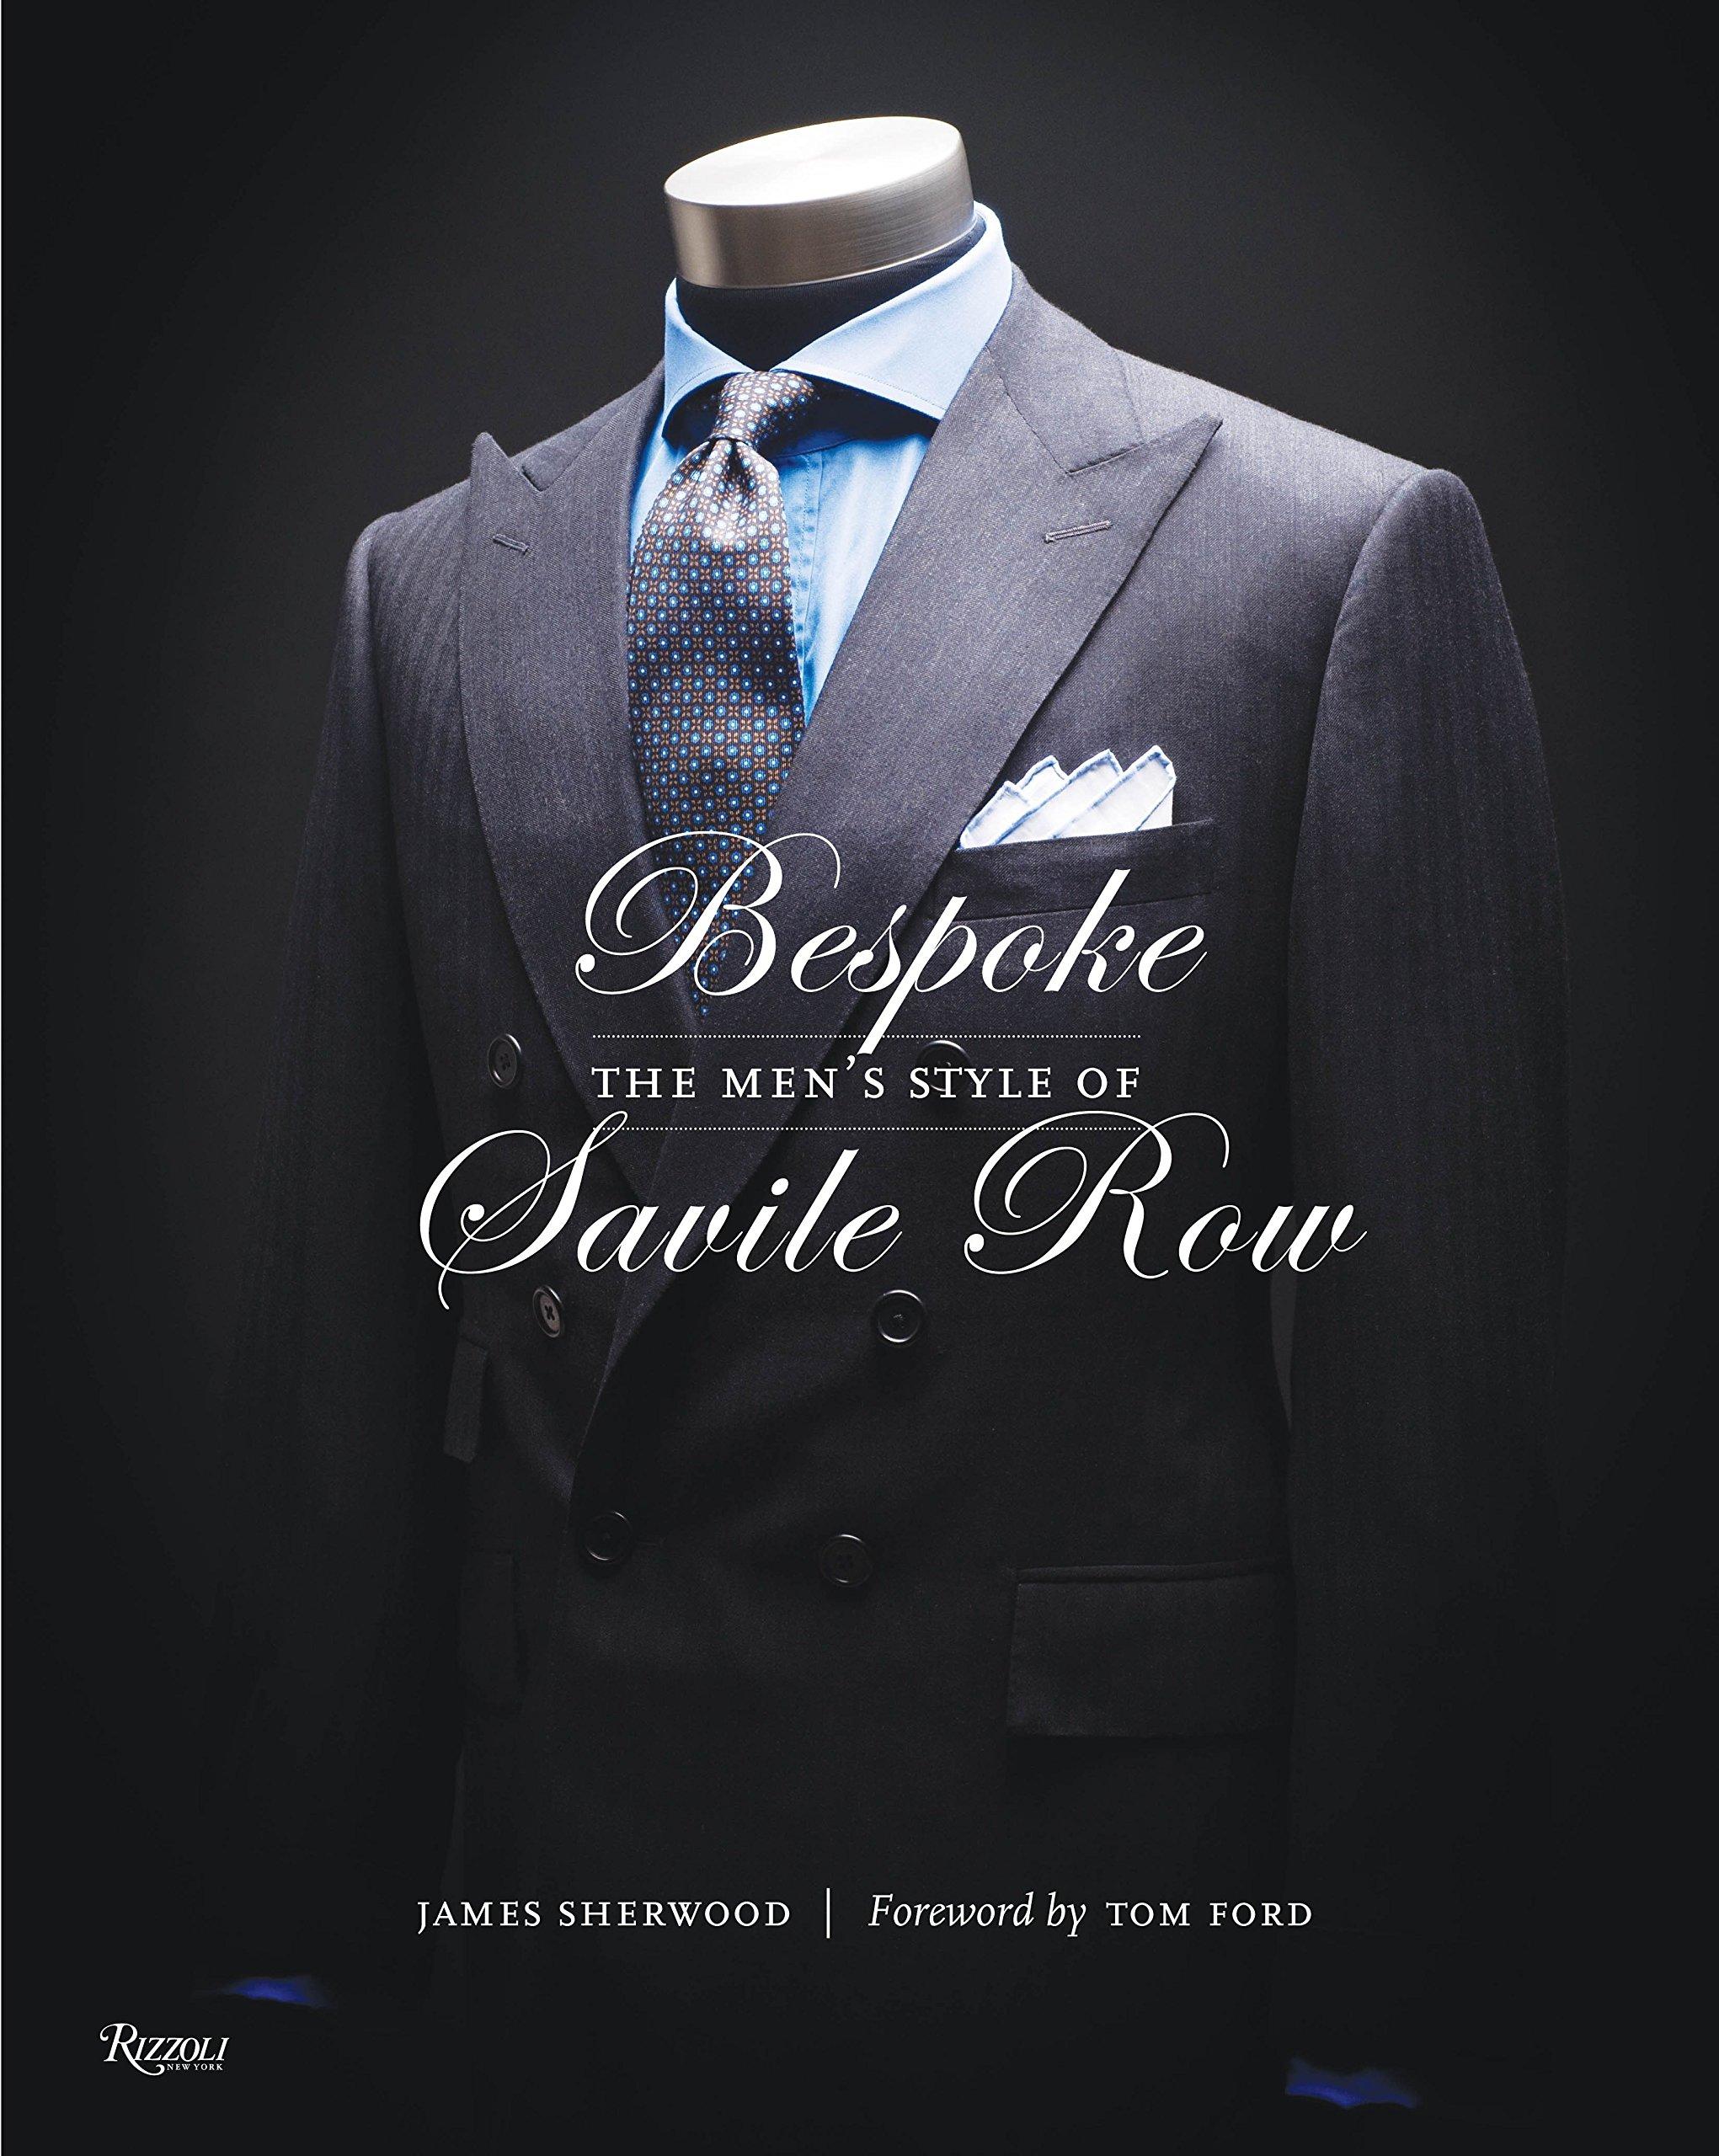 Bespoke: The Men's Style of Savile Row ebook